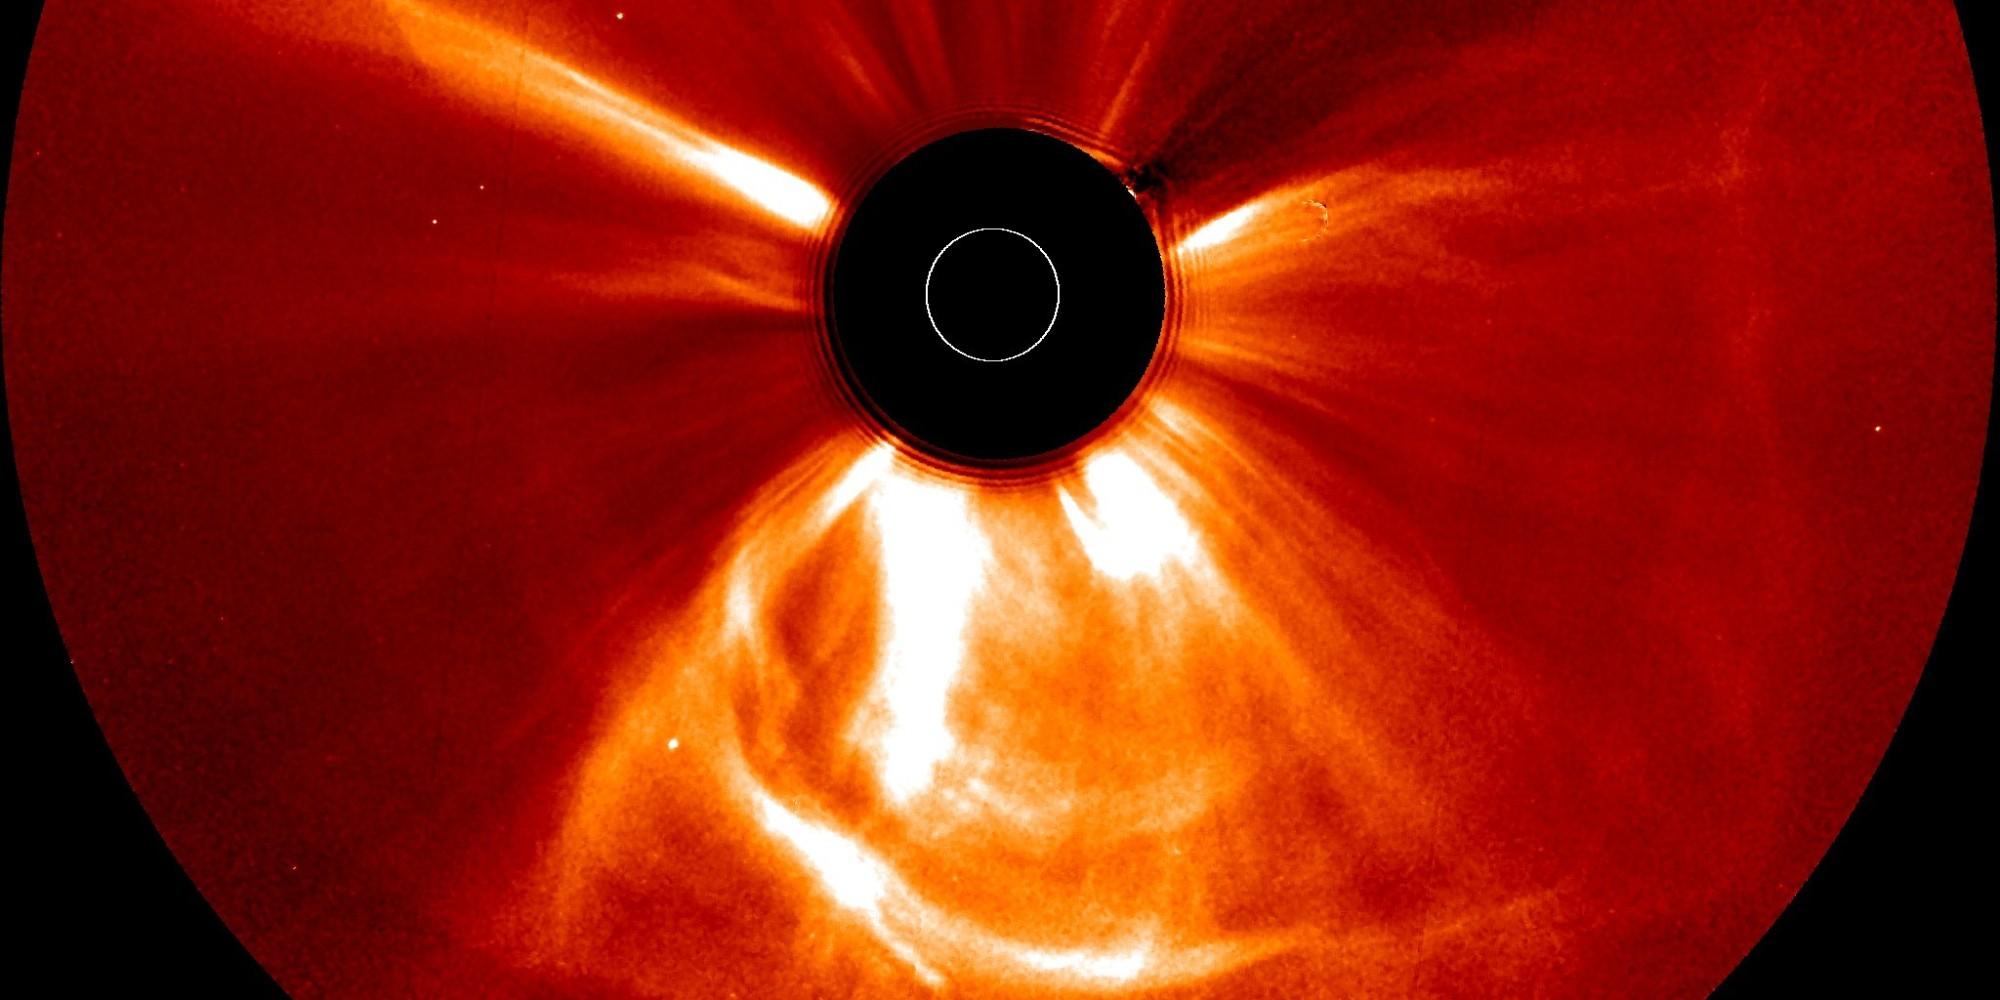 solar storm 2012 - photo #26